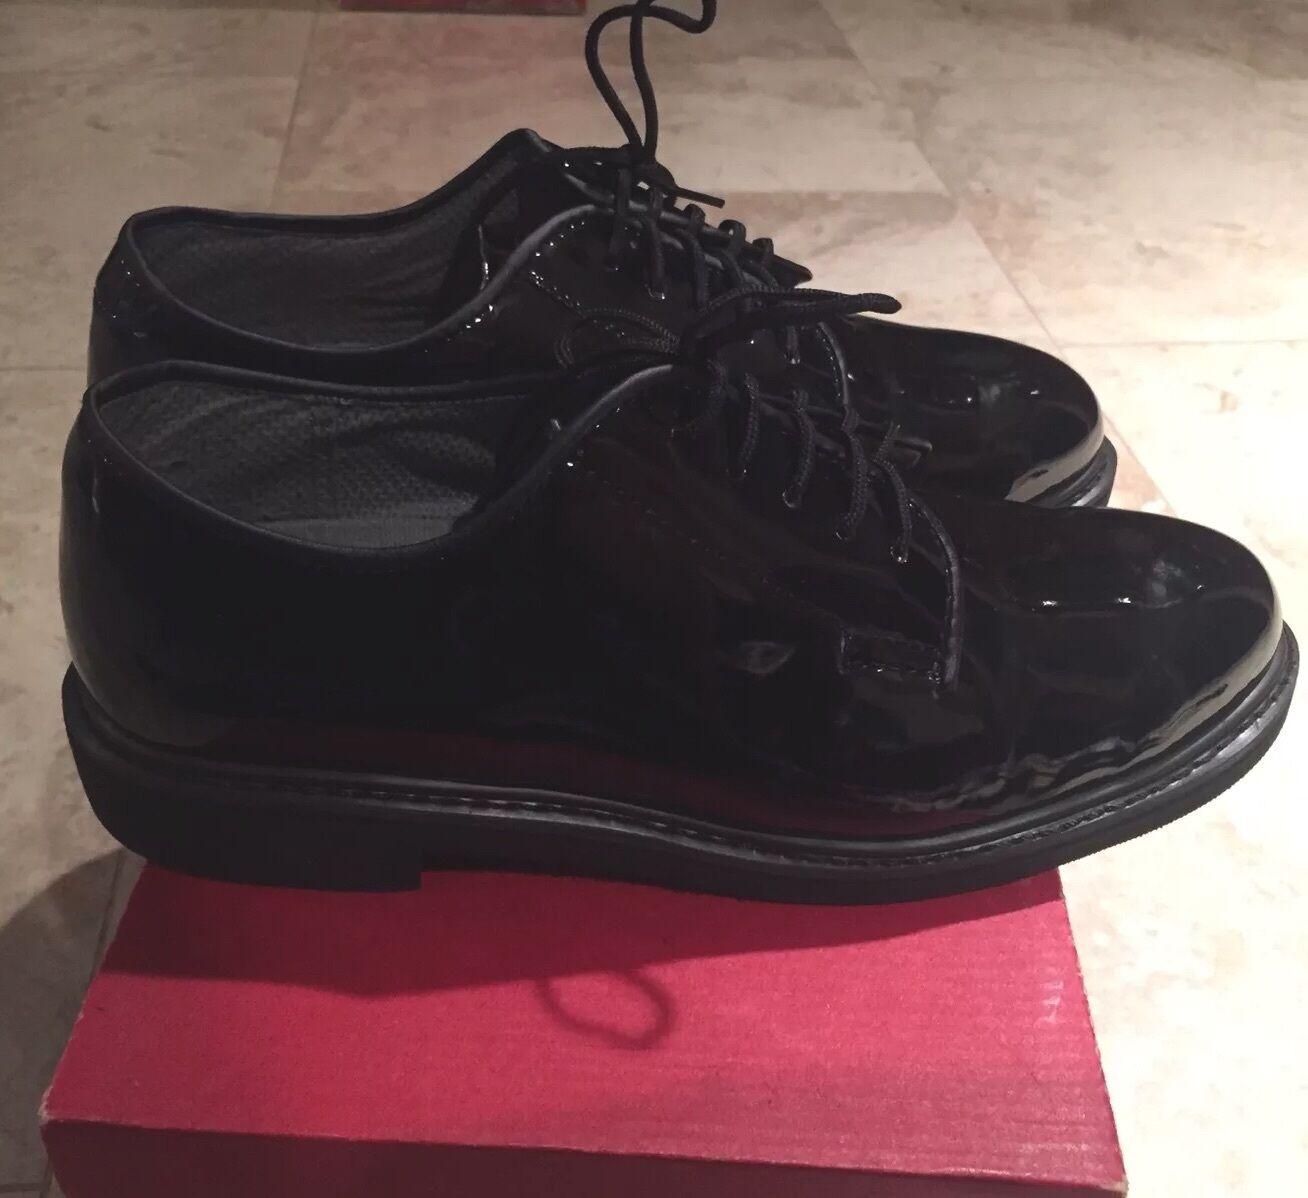 Rothco Military 5055 Oxford High Gloss Military Rothco Uniform Shoe Size 10.5 6068de